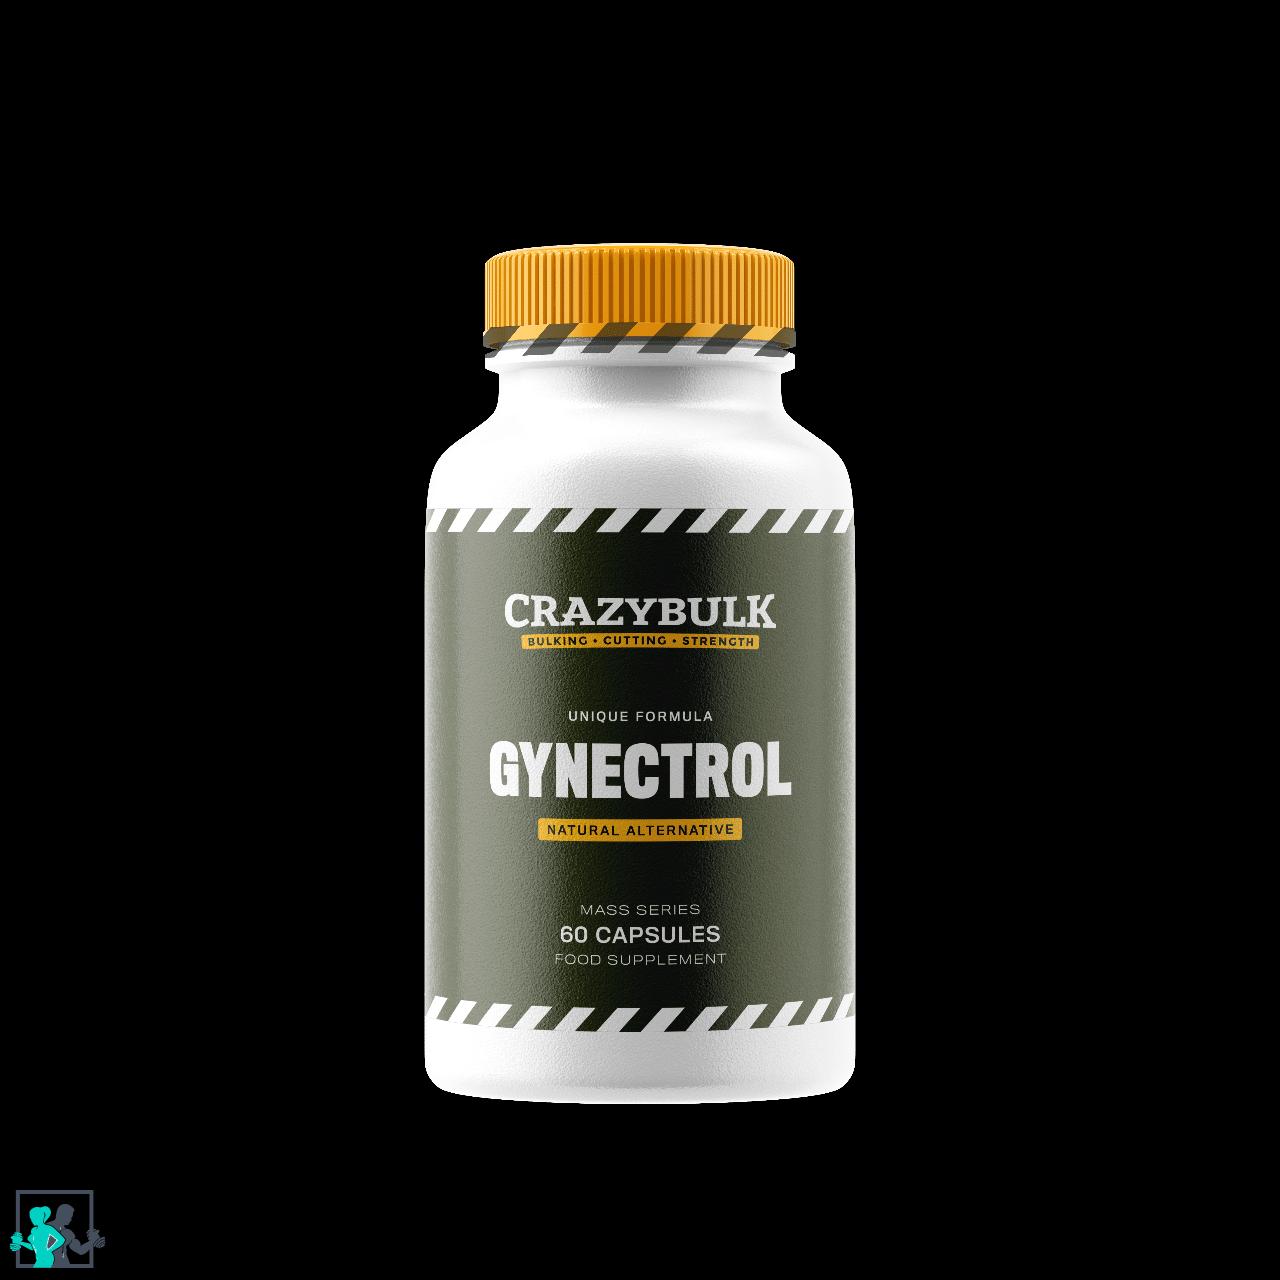 Bouteille de Gynectrol